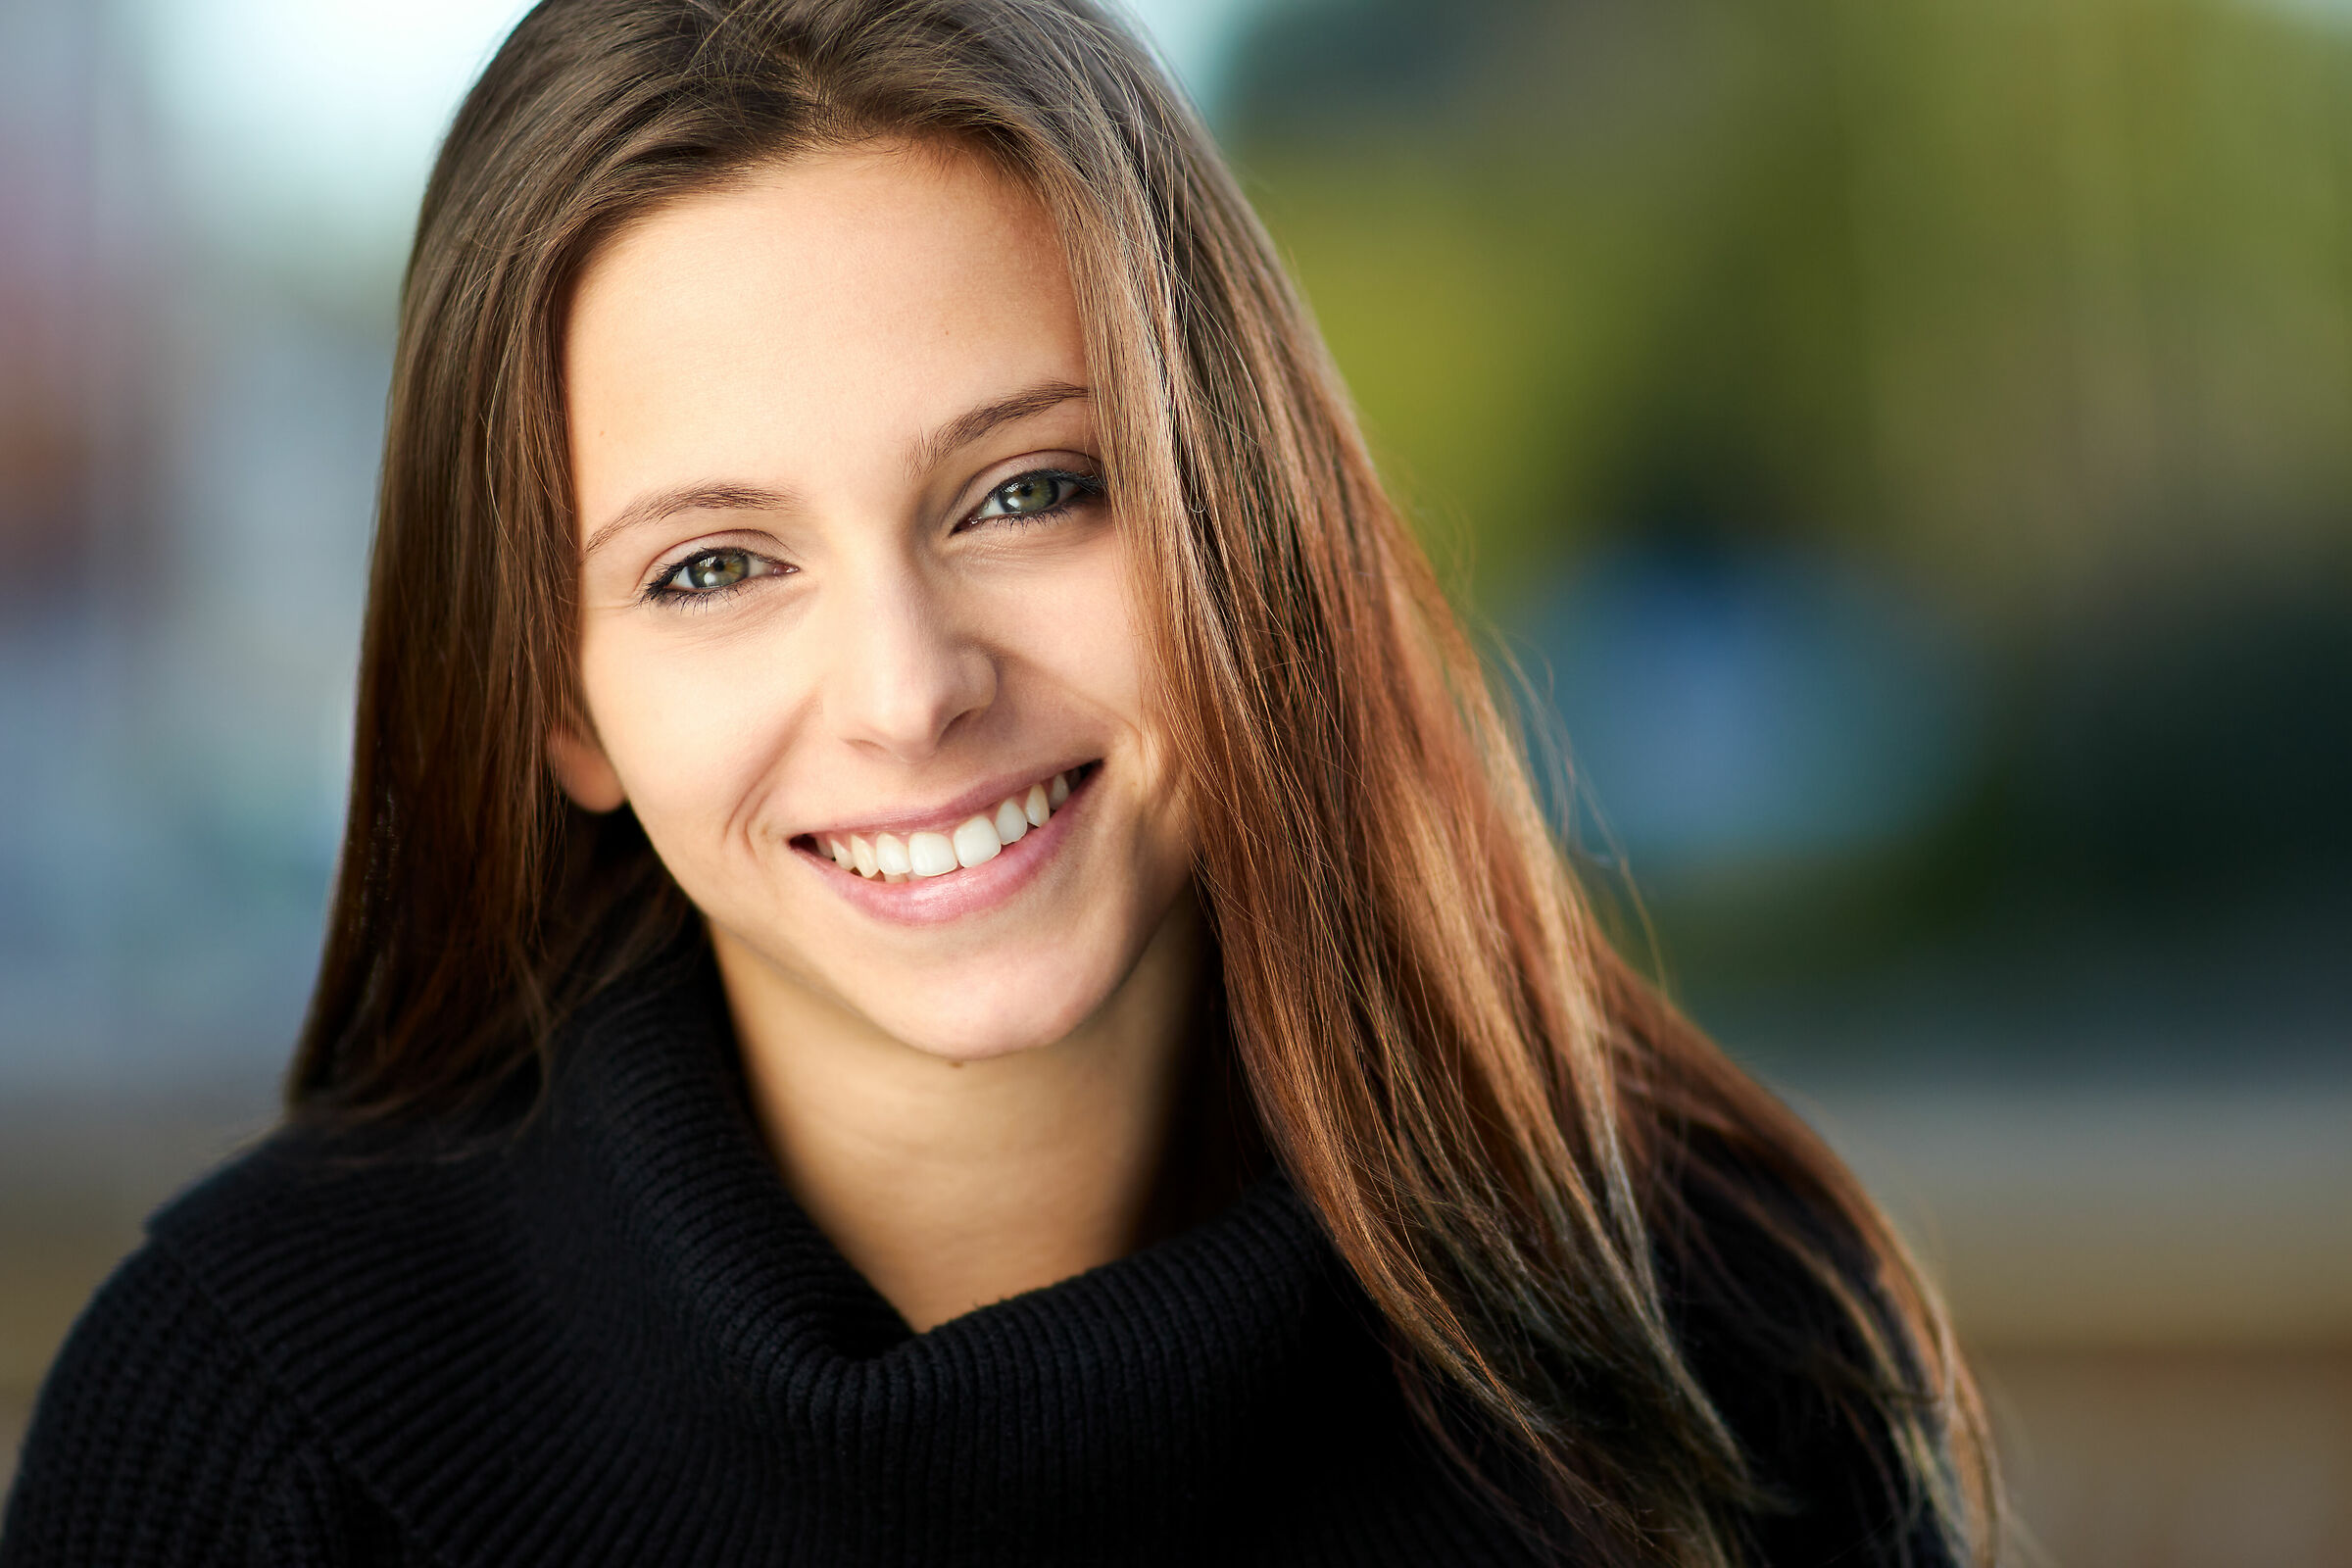 Maria Chiara 3 - Actress...